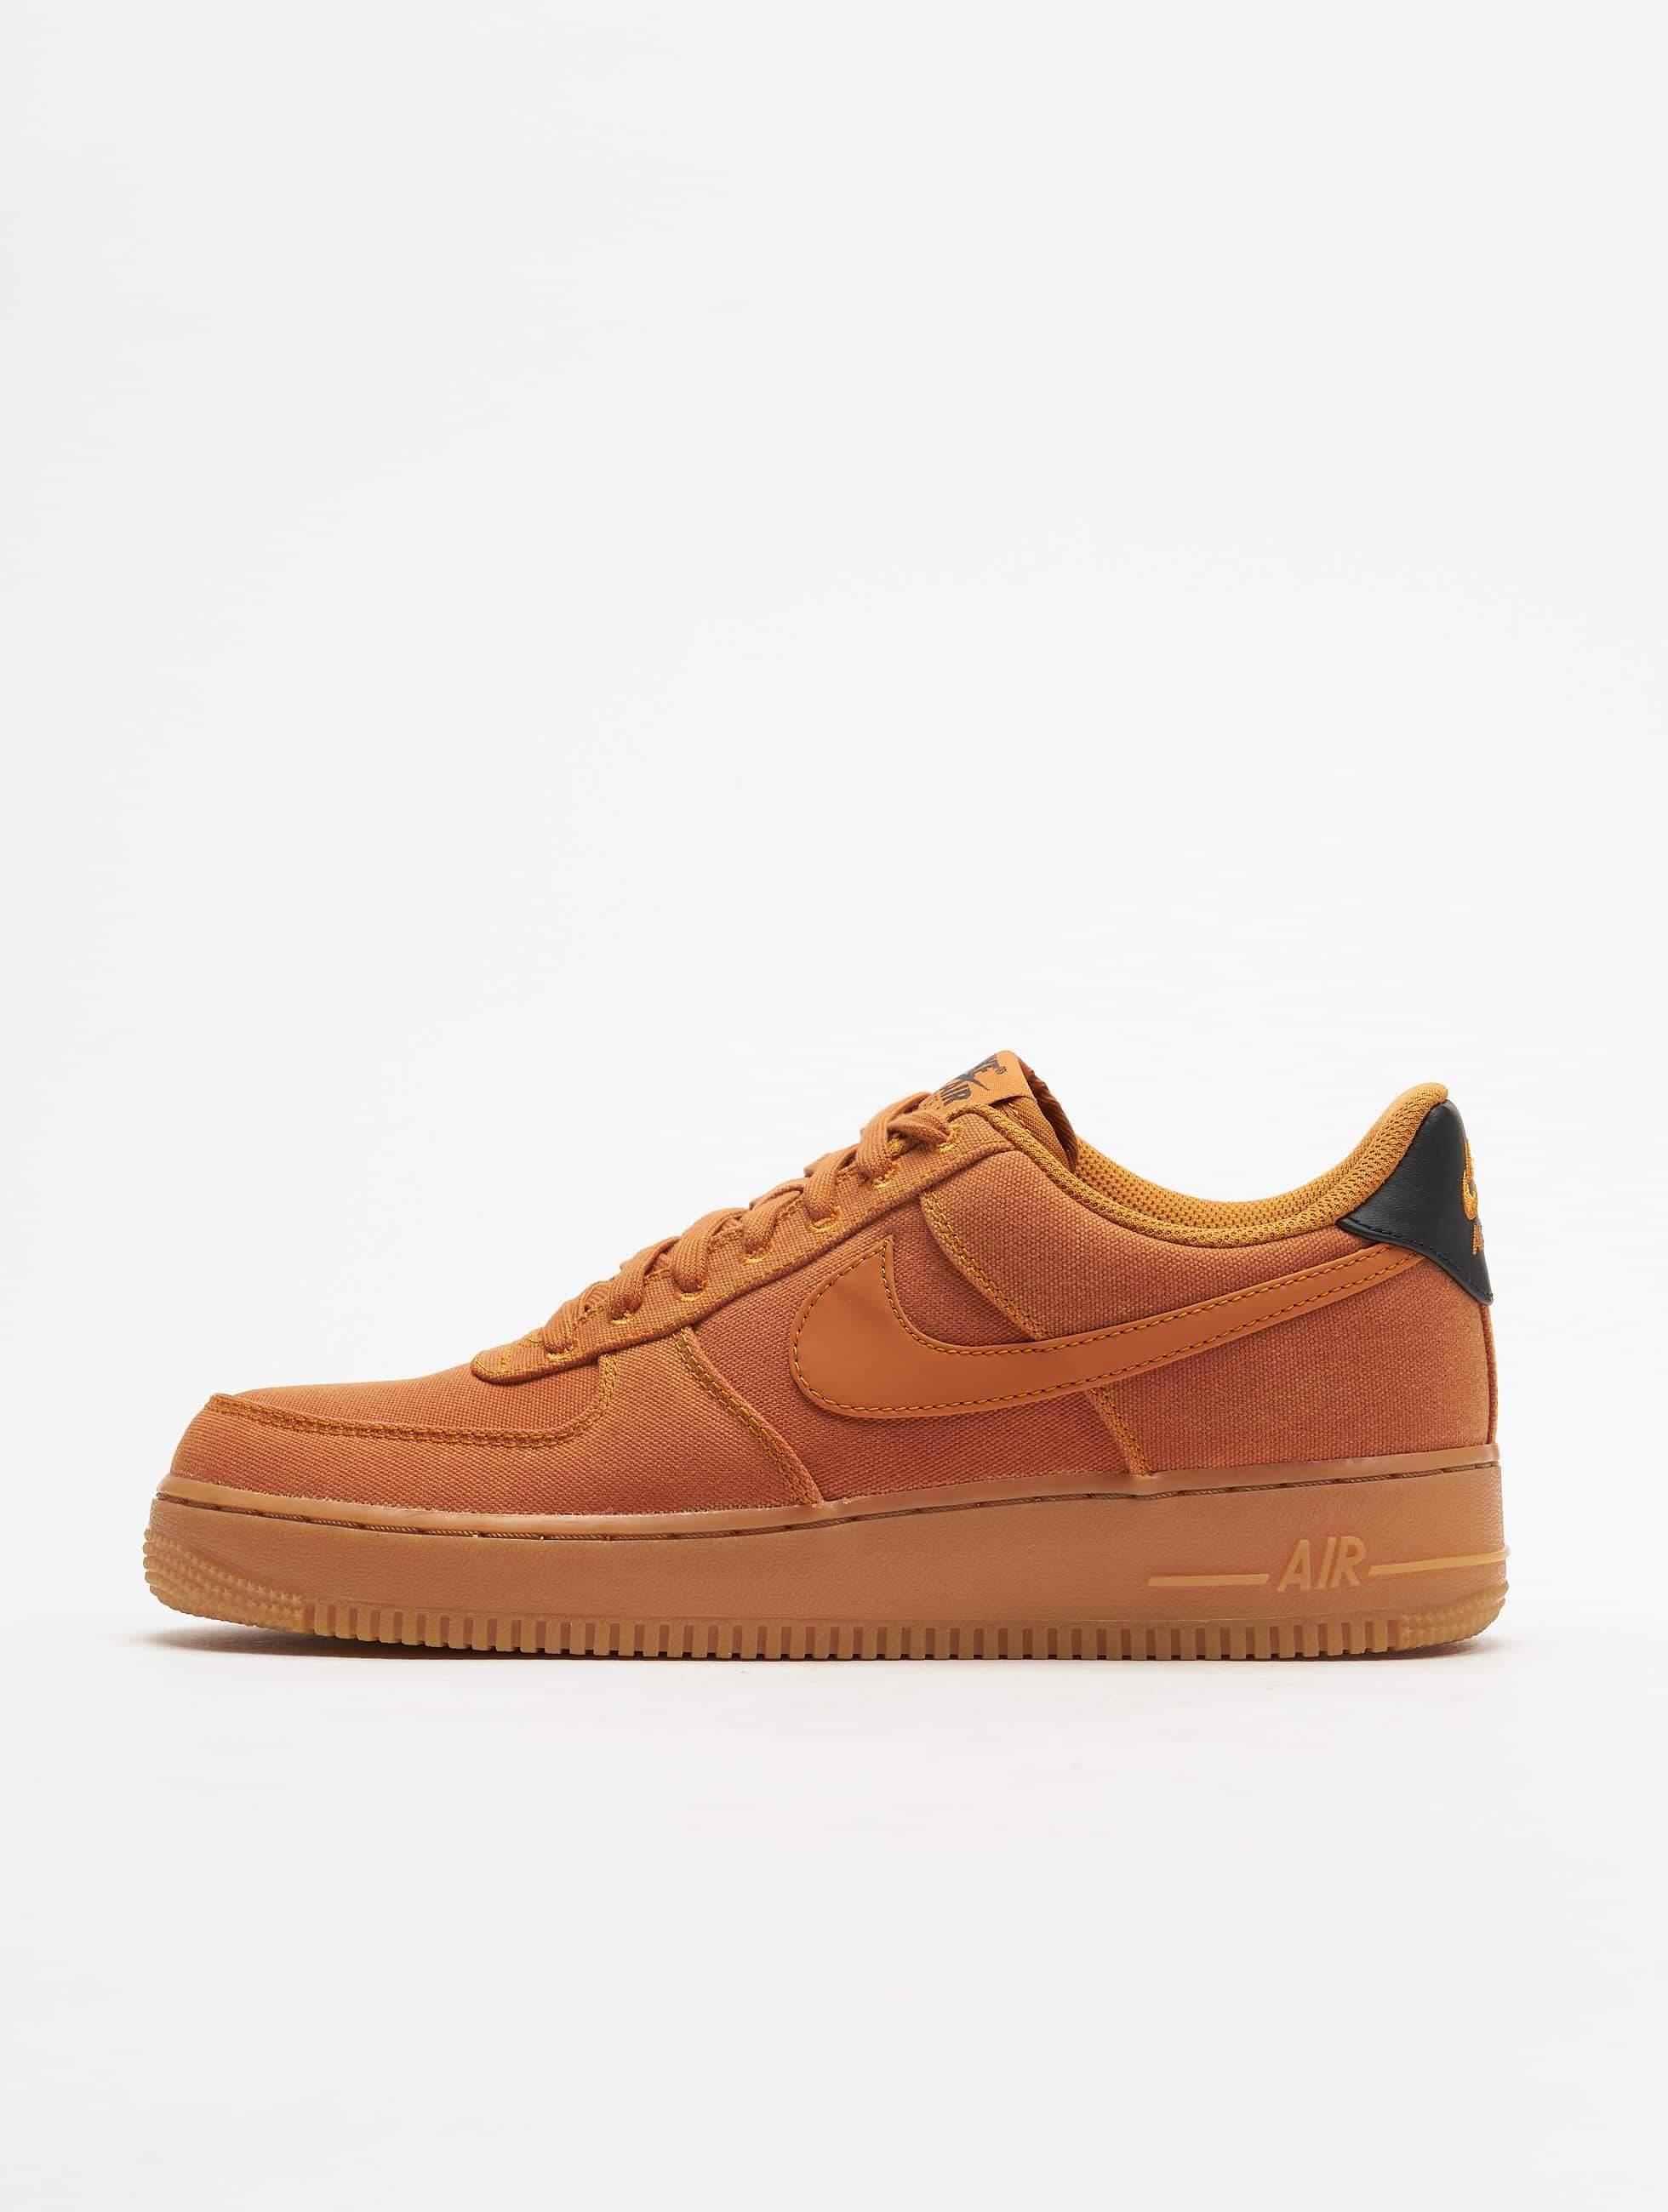 723db388acf Nike schoen / sneaker Air Force 1 07 LV8 in bruin 538111